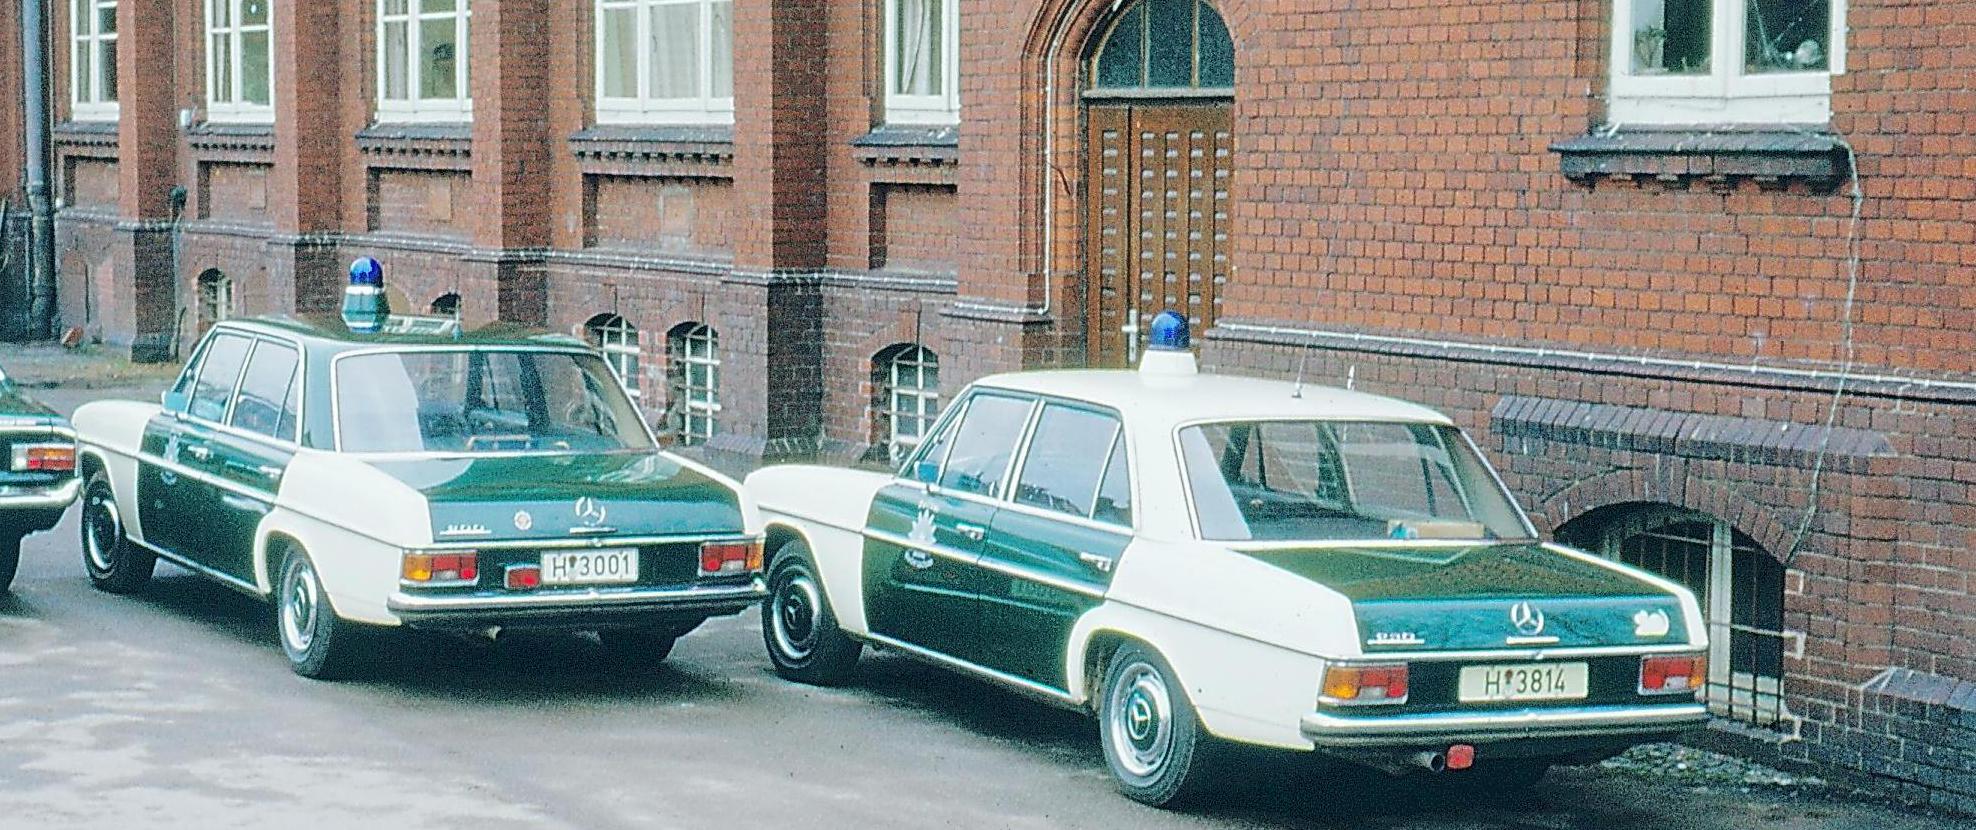 Funkstreifenwagen der Motorisierten Verkehrsstaffel Hannover in Ahlem